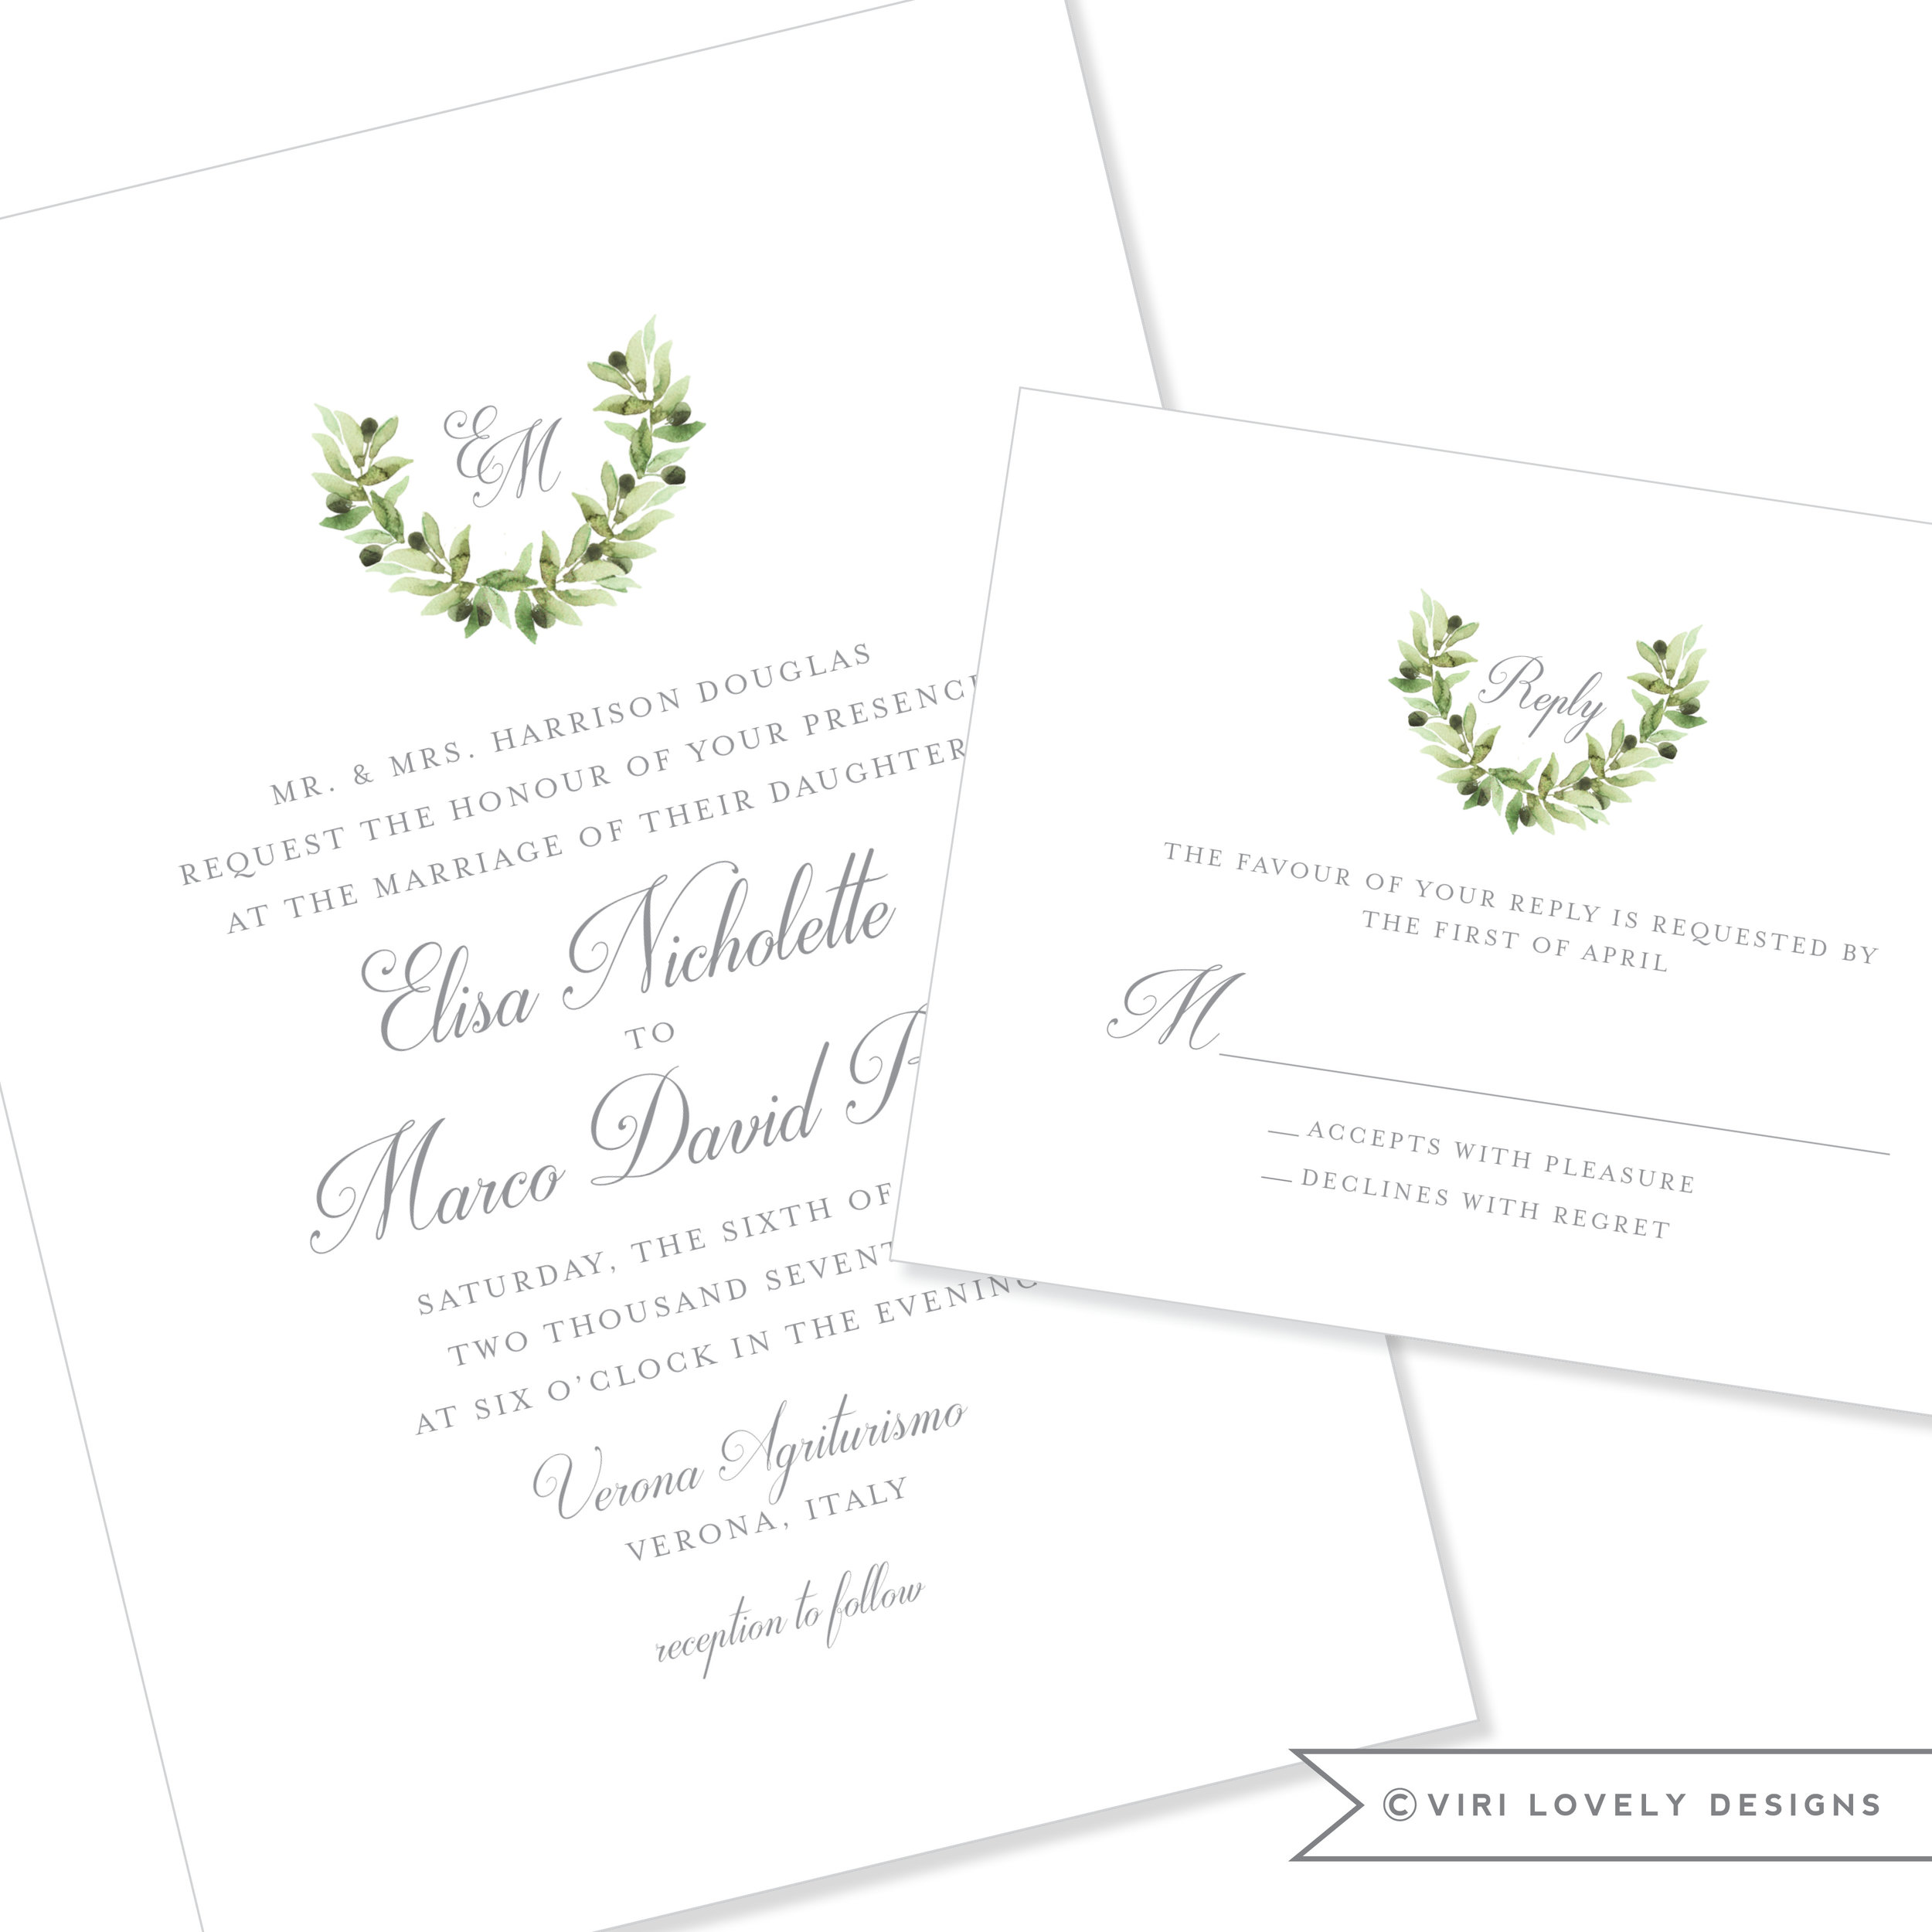 Olive Monogram Crest Wedding Invitation #1207